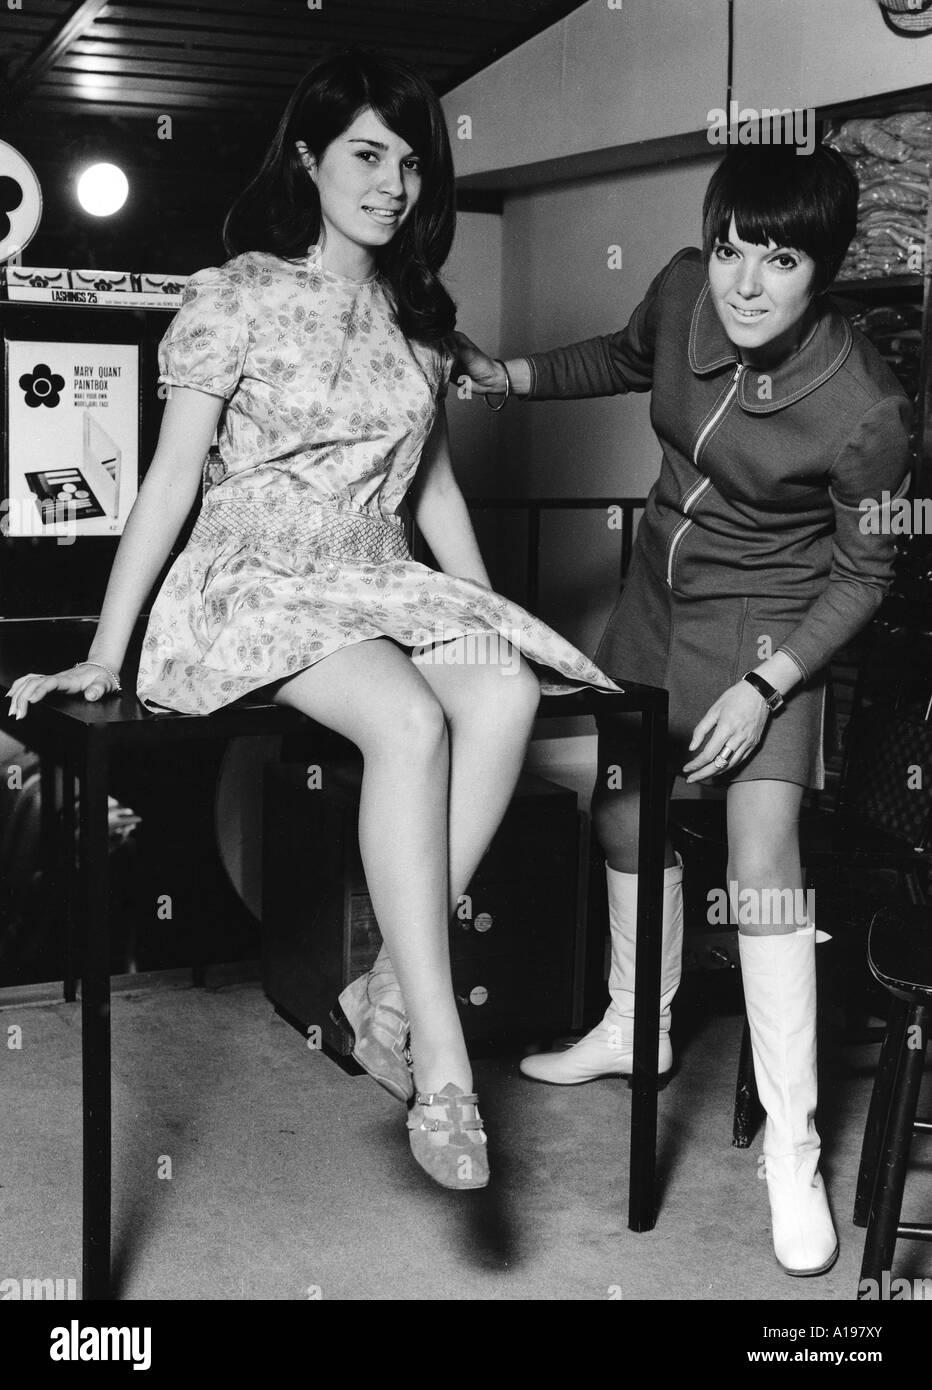 Mary quant biography fashion Betsey Johnson - Fashion Designer - Biography